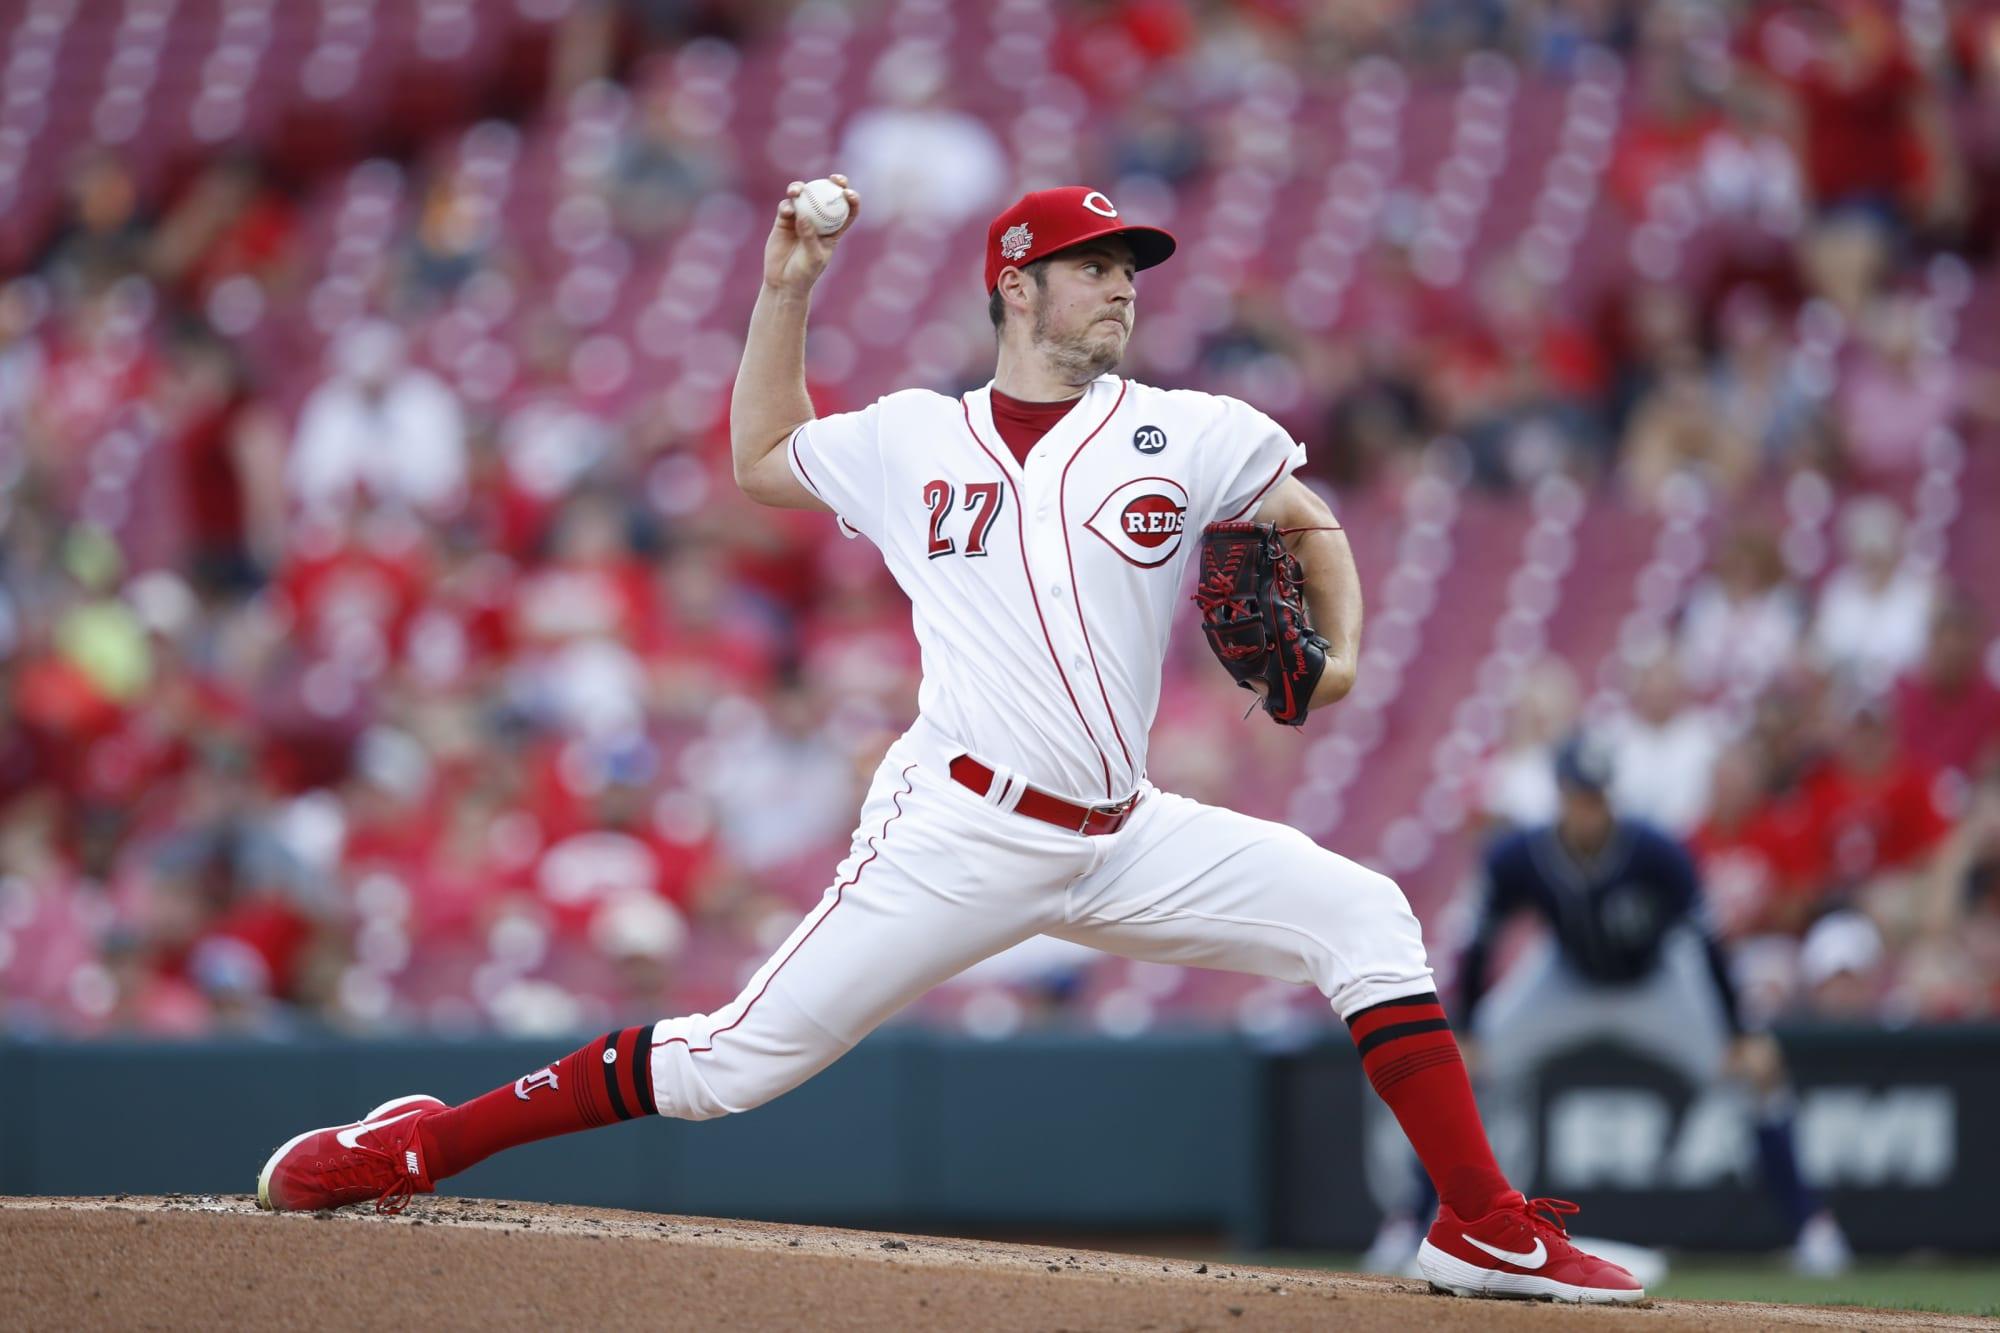 Reds pitcher Trevor Bauer trolls Houston Astros with latest t-shirt design